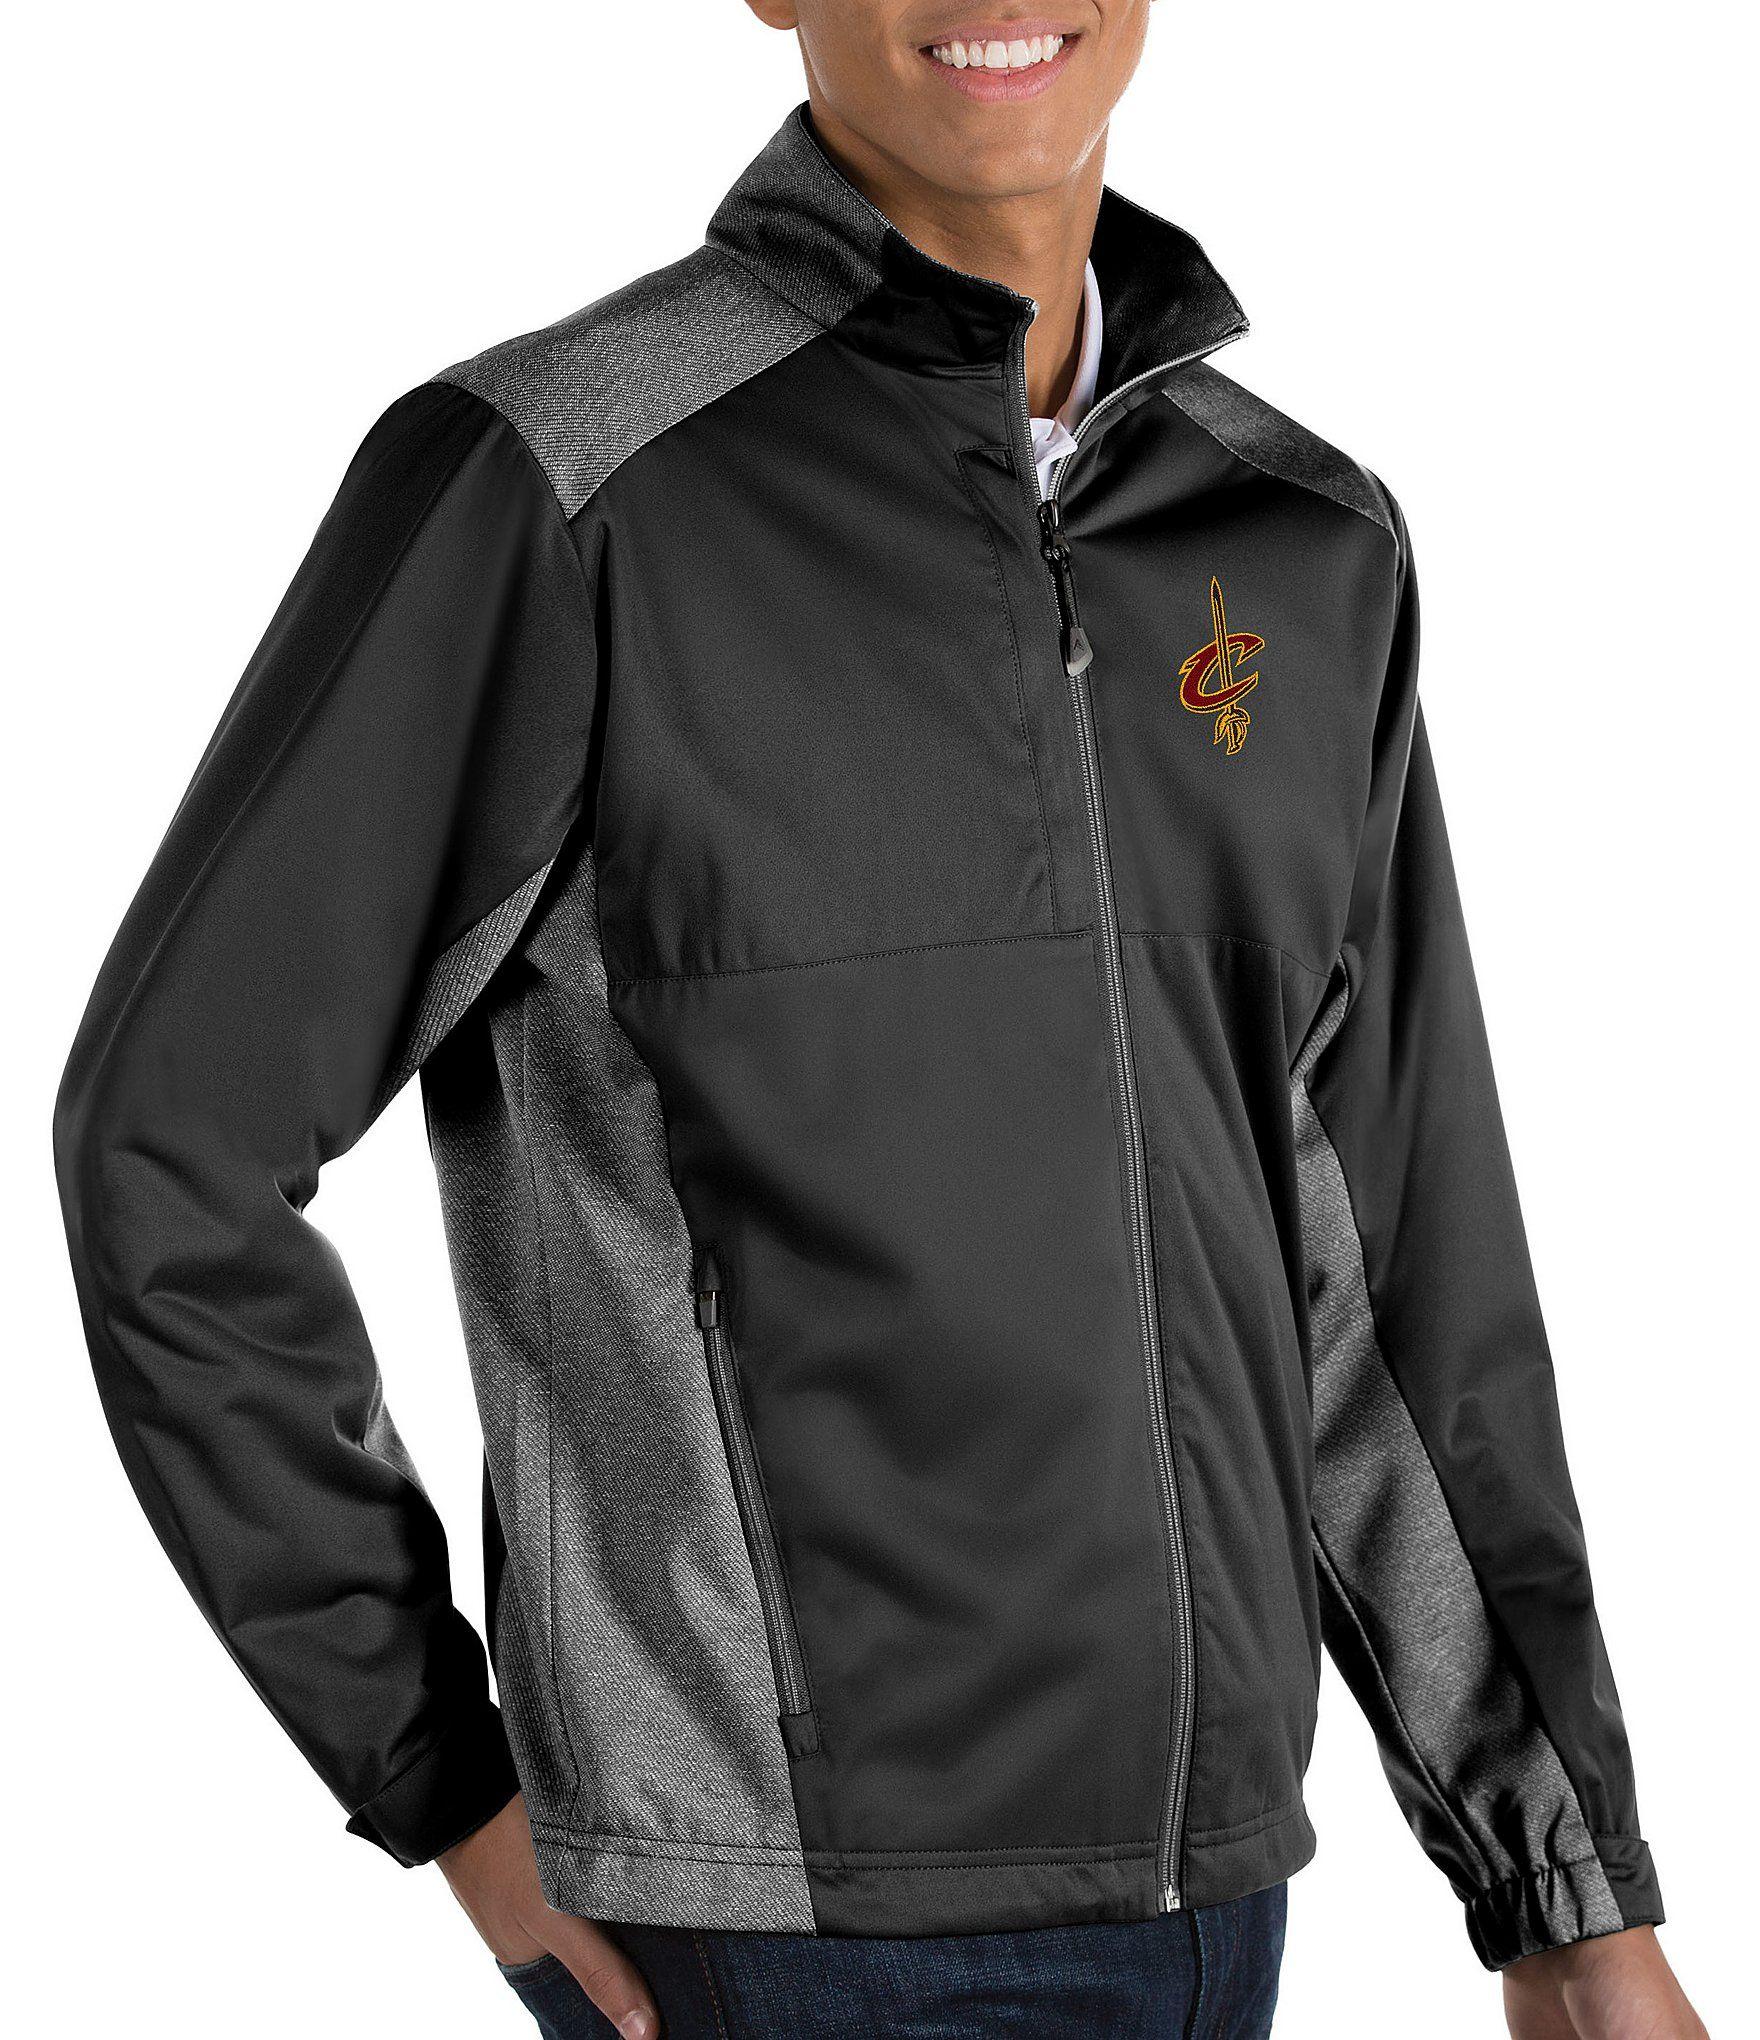 Antigua NBA Revolve Full-Zip Waterproof Jacket | Dillard's